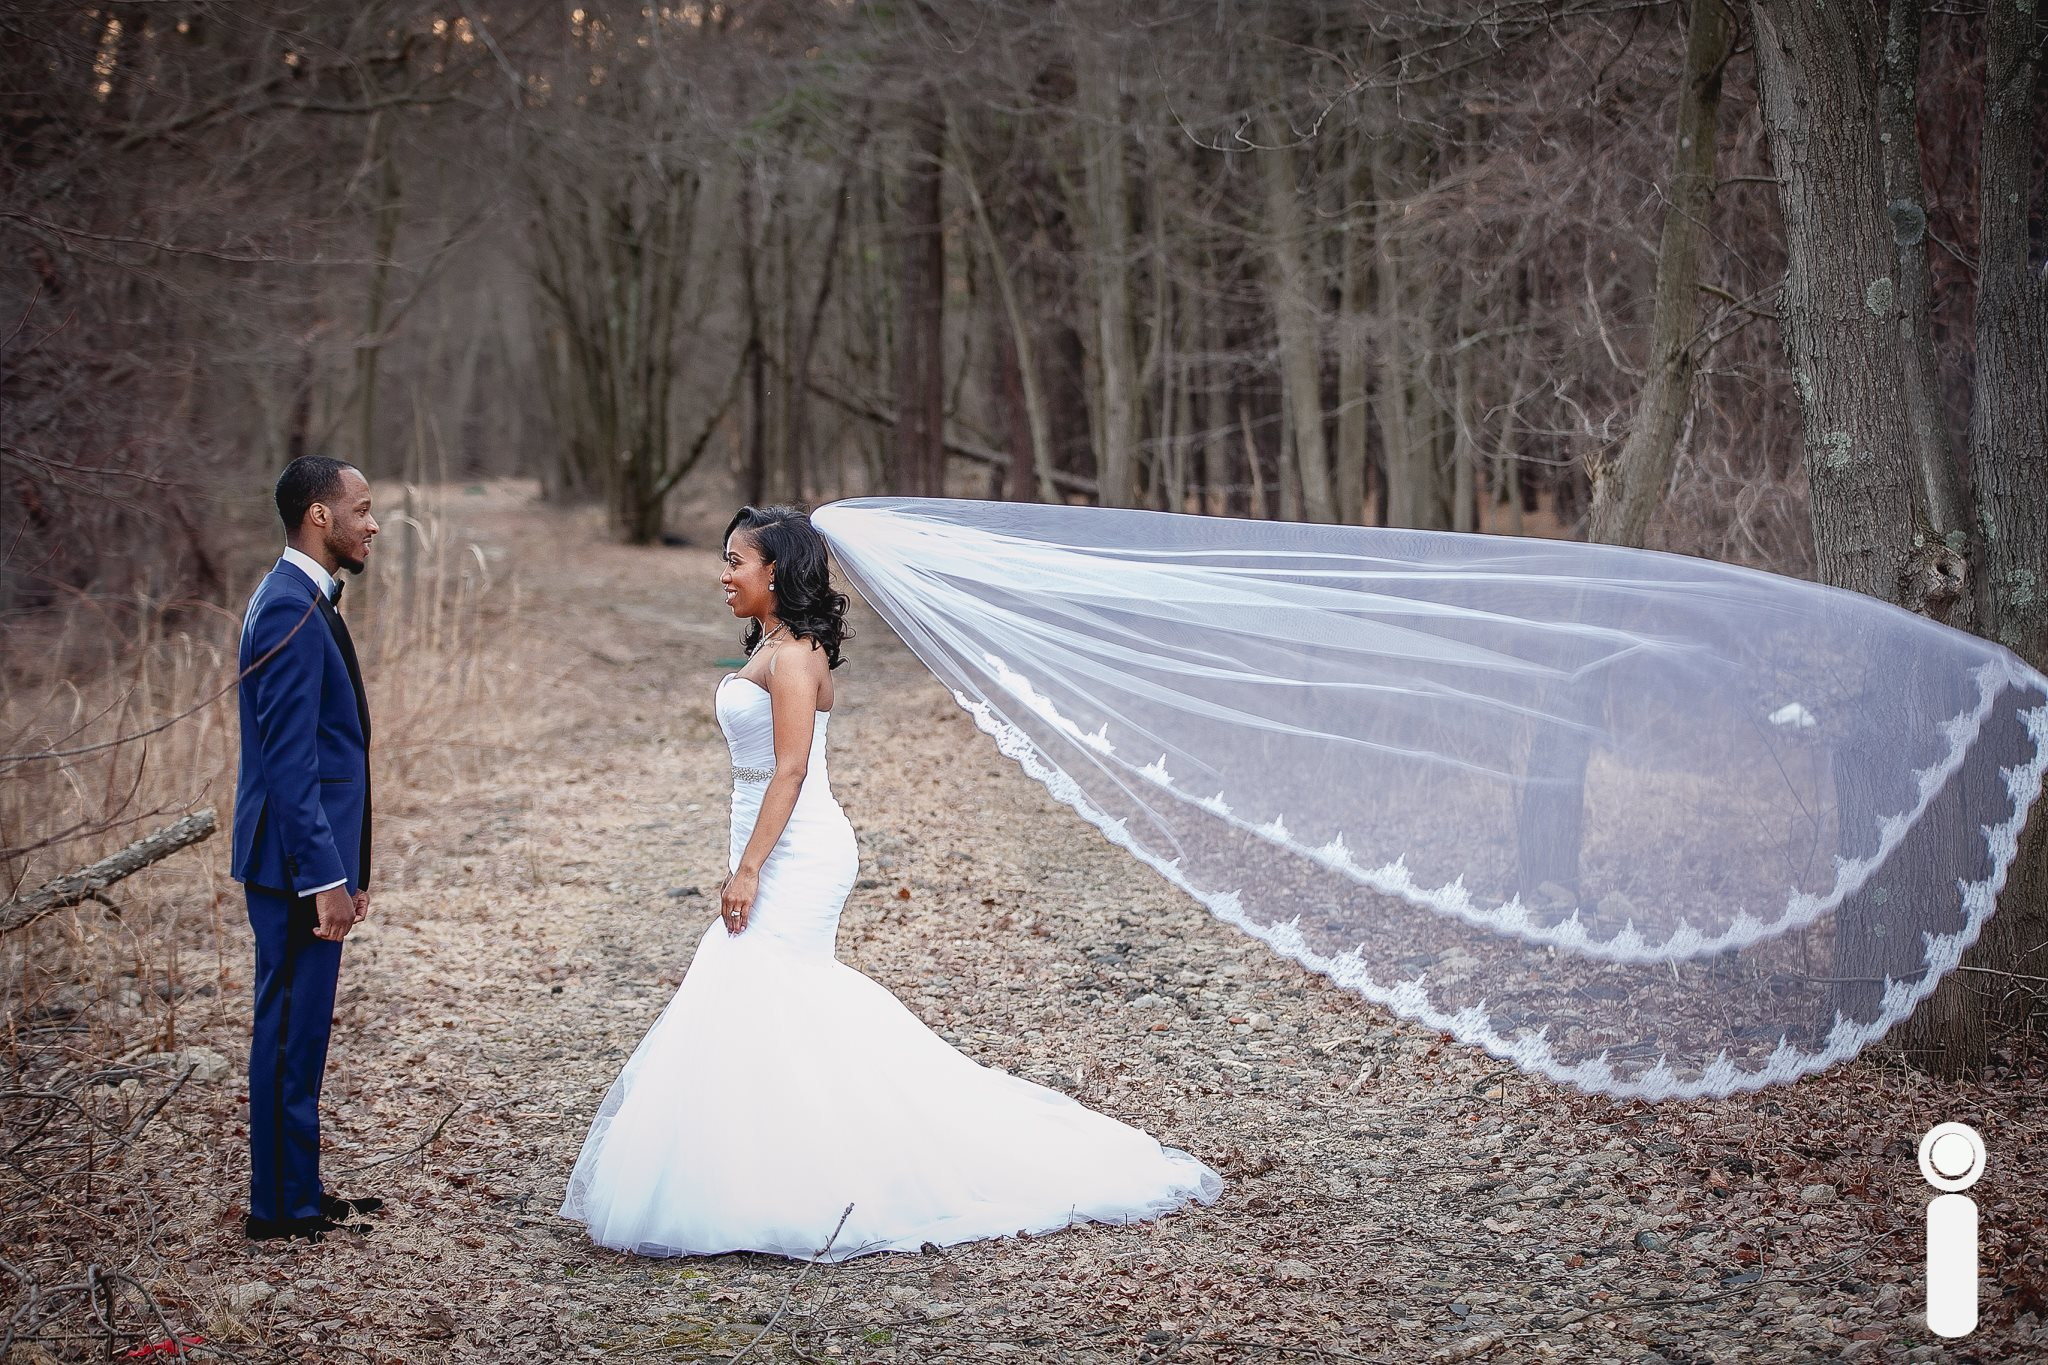 farrel wedding 2.jpg